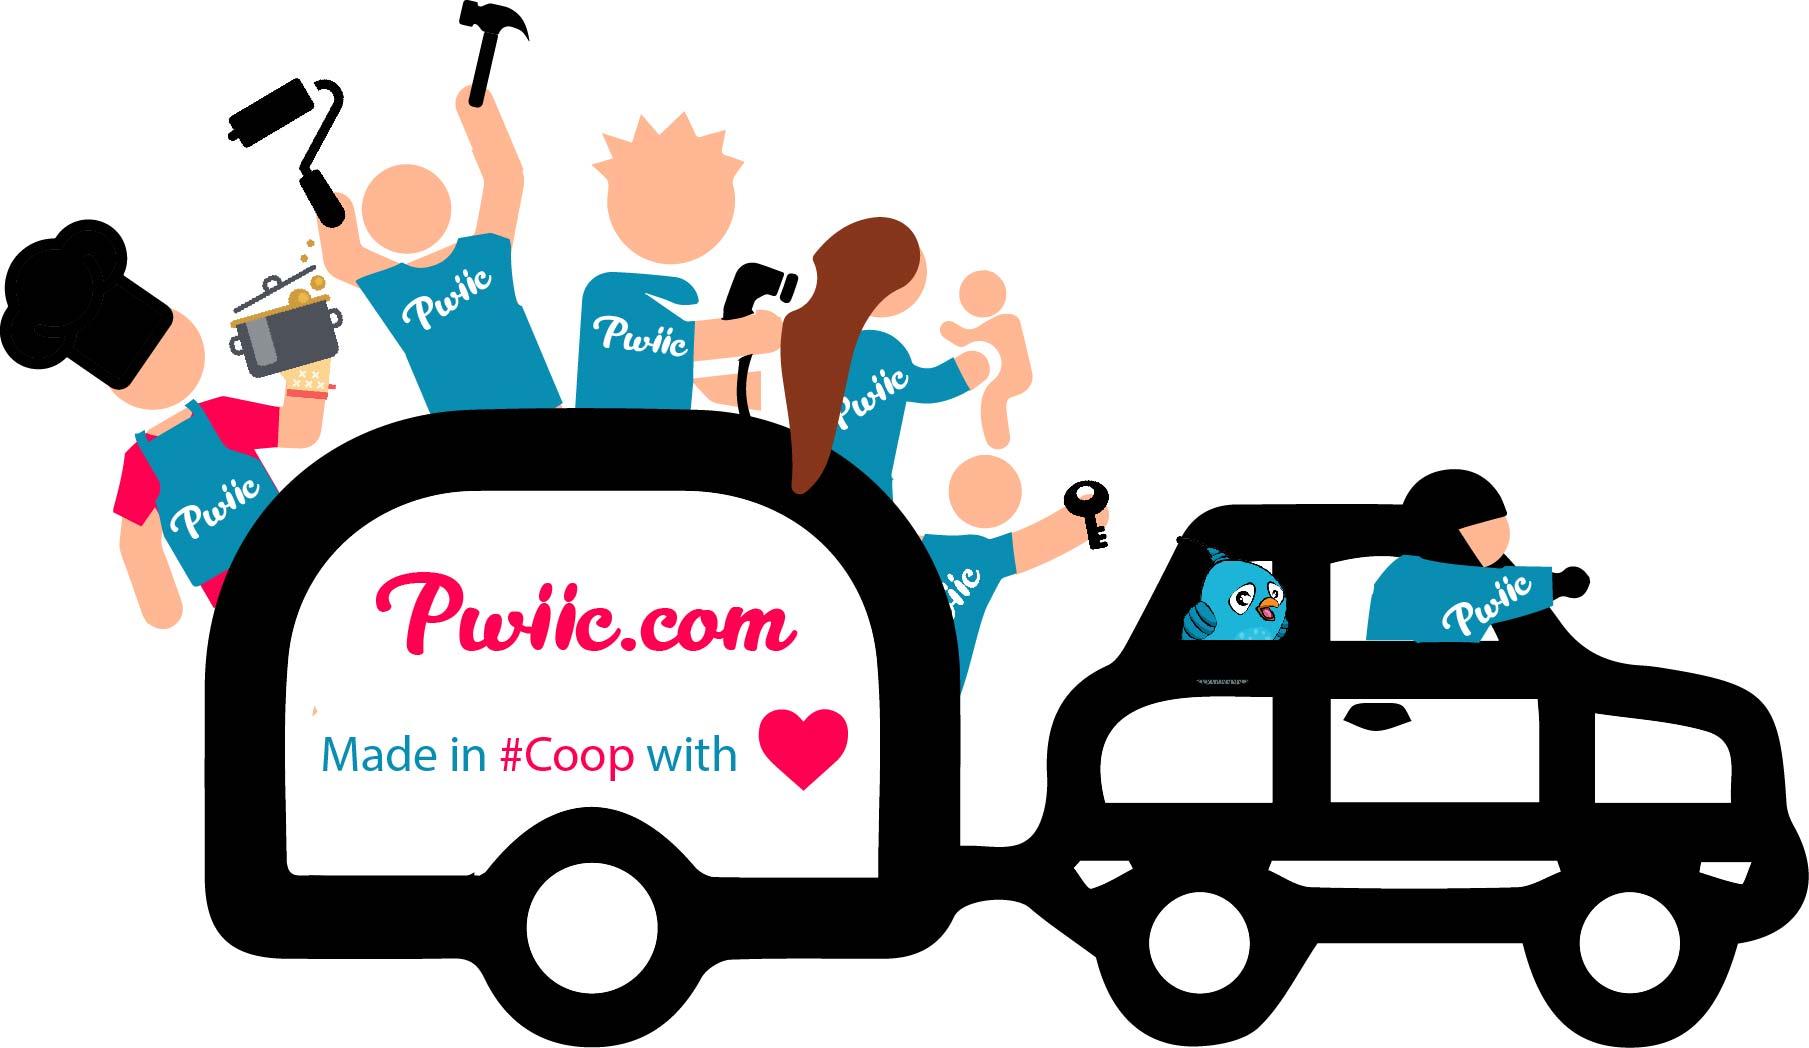 Devenir membre de la coopérative pwiic.com